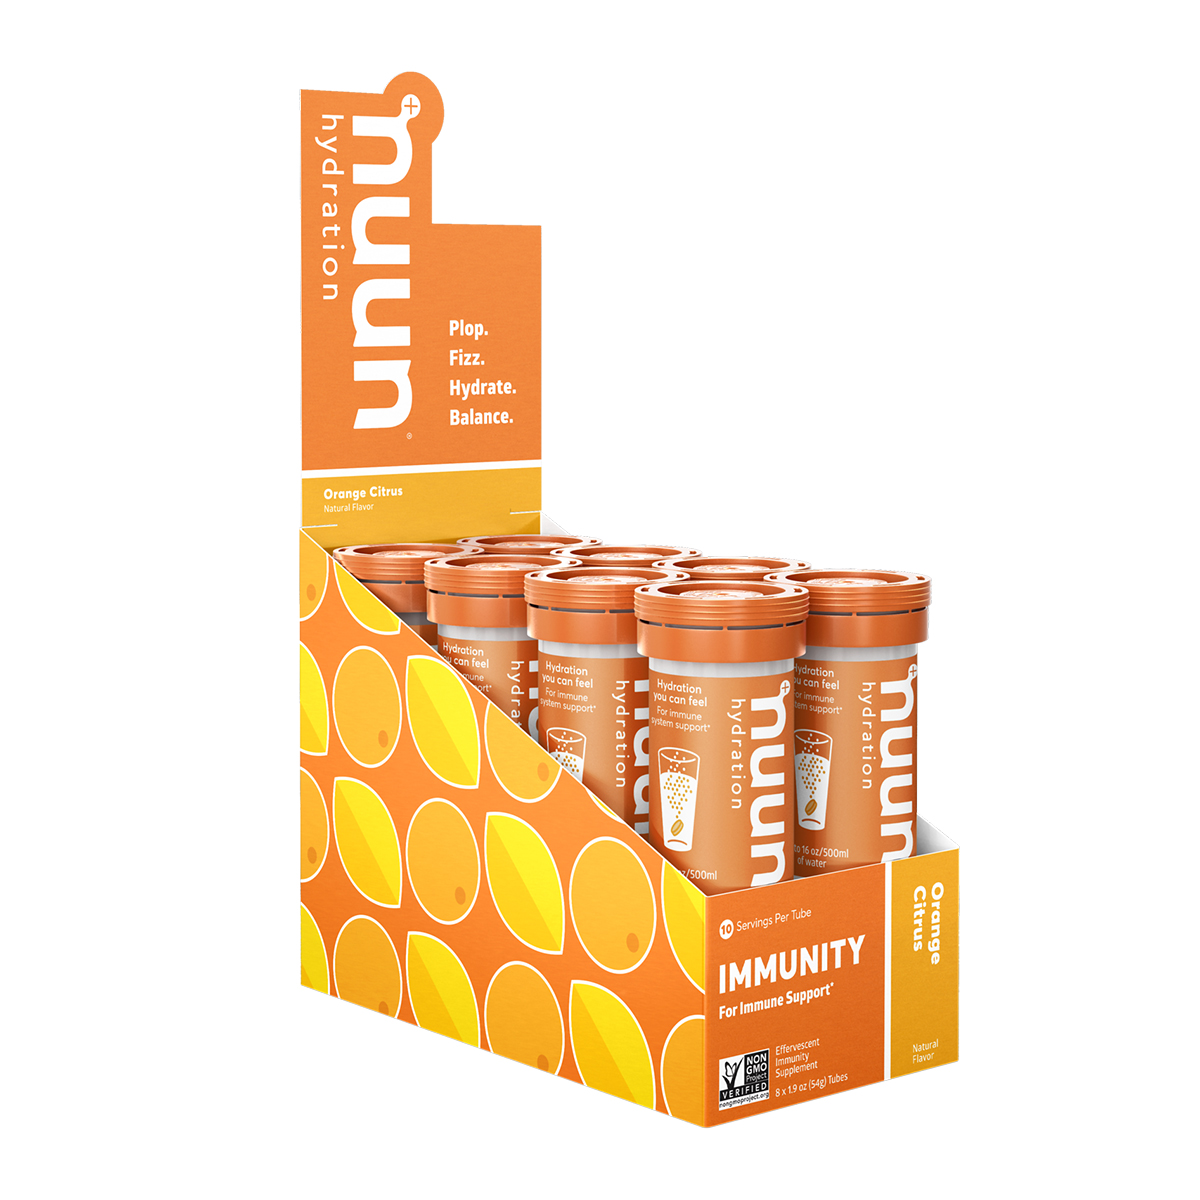 Nuun Immunity Drink Tablets - Flavor: Orange Citrus - Size: Box of 8, Orange Citrus, large, image 1